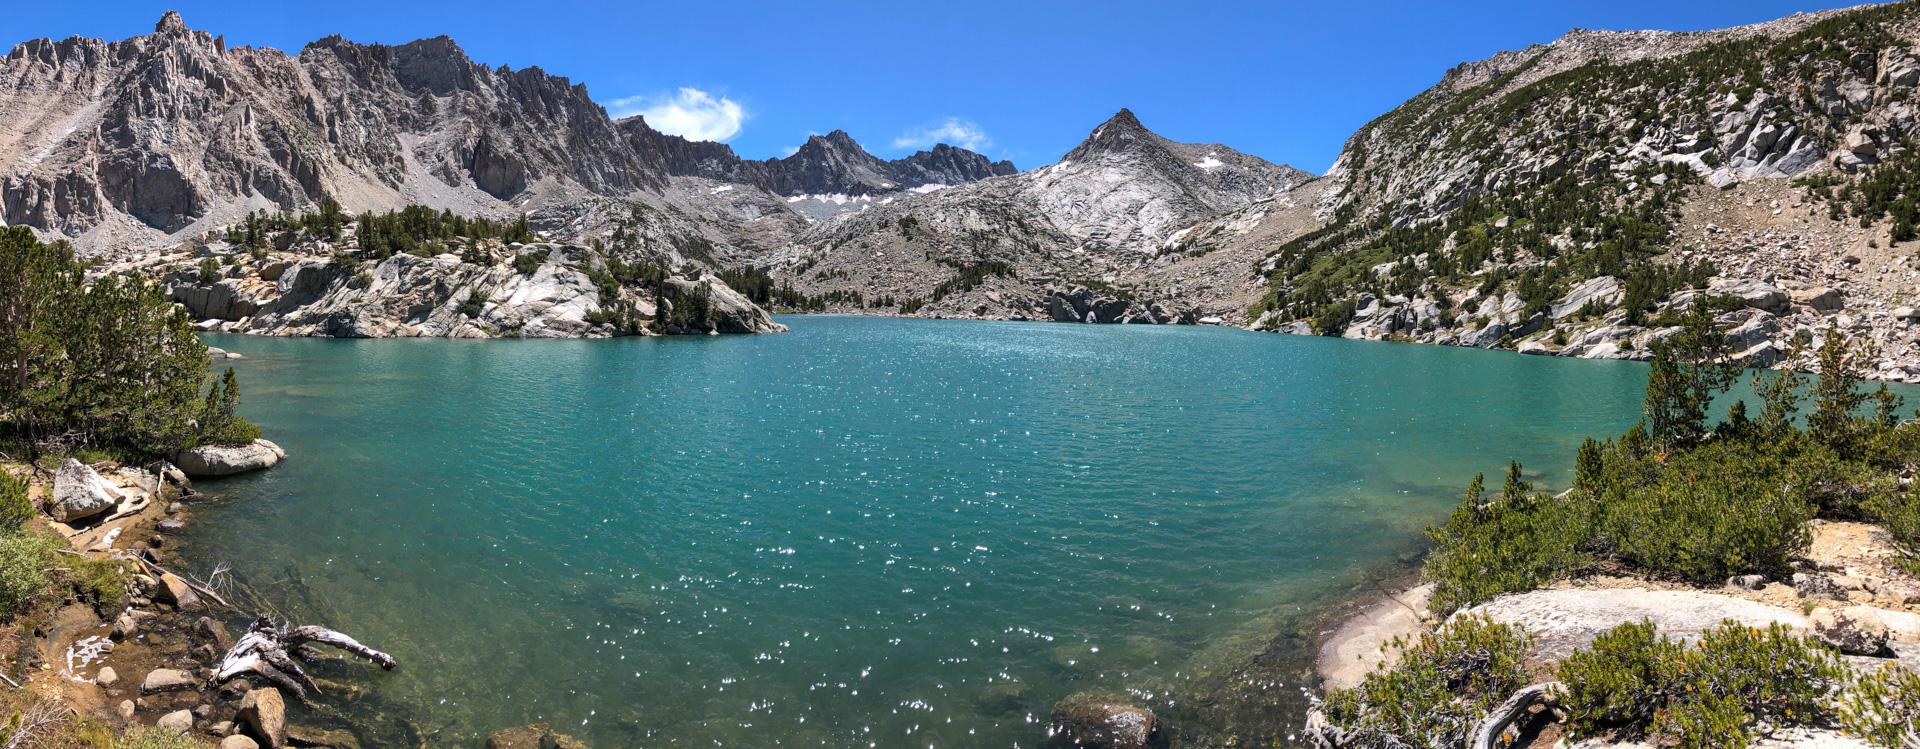 Panorama of Baboon Lakes